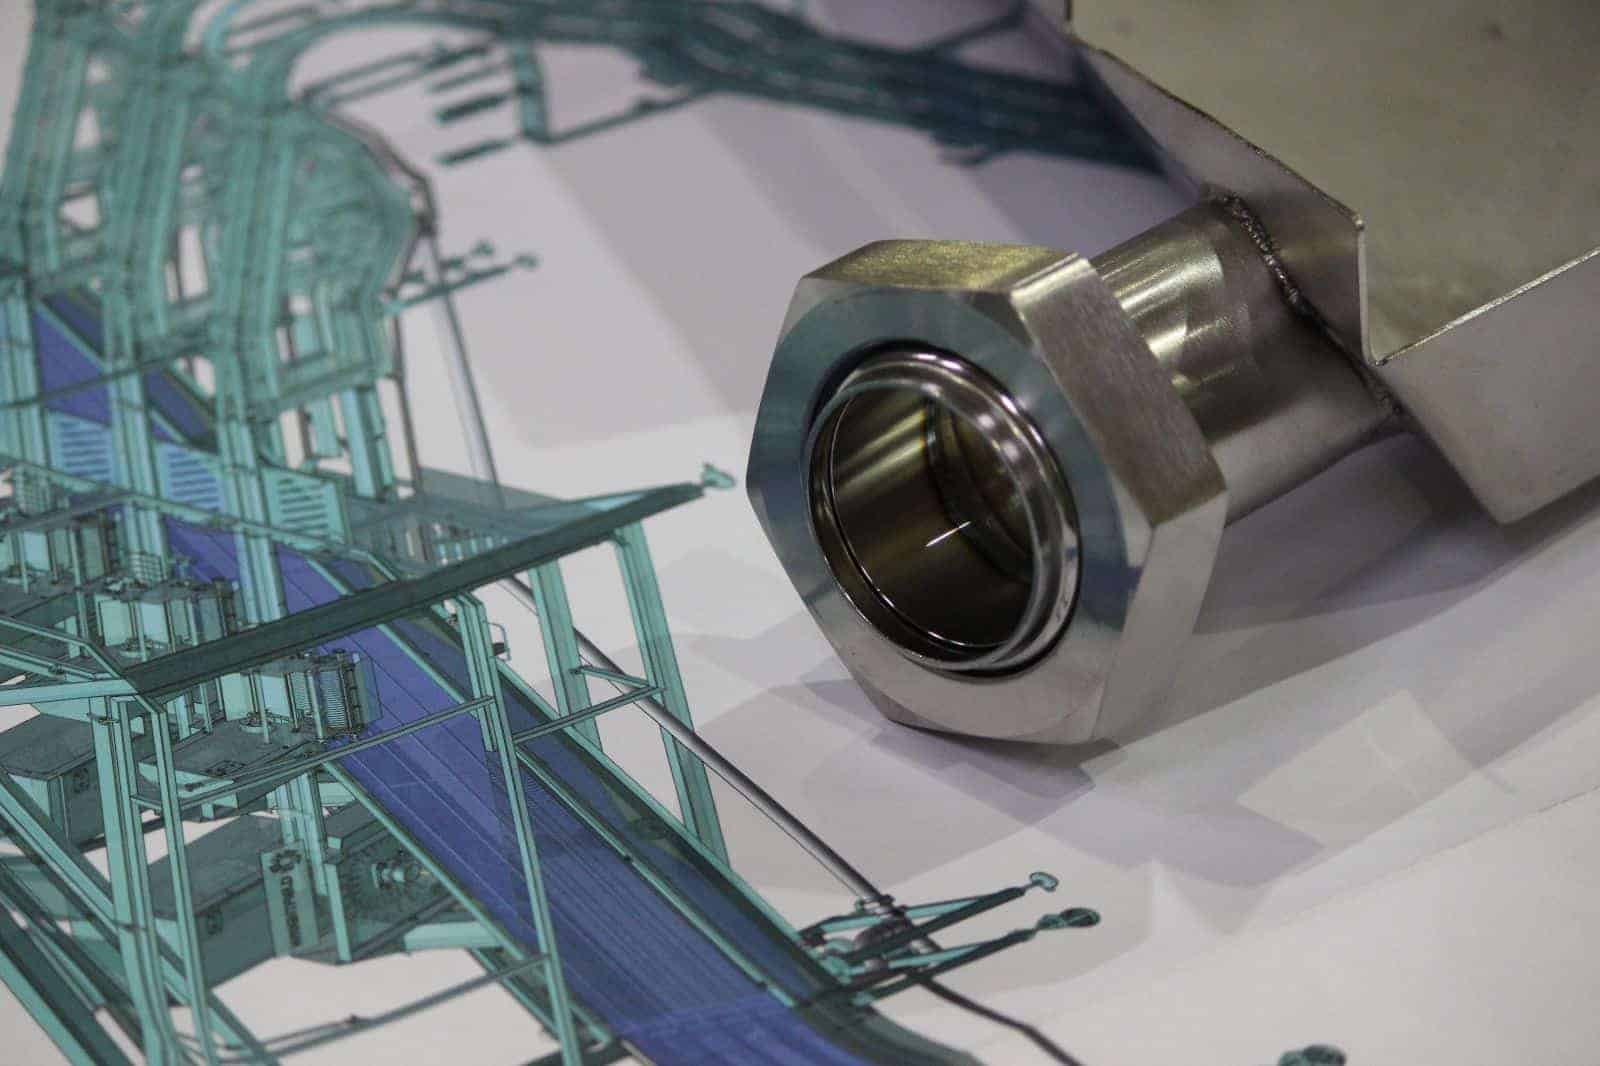 Bespoke Metalwork Conveyor System Design Automated Conveyor System Wrightfield Ltd